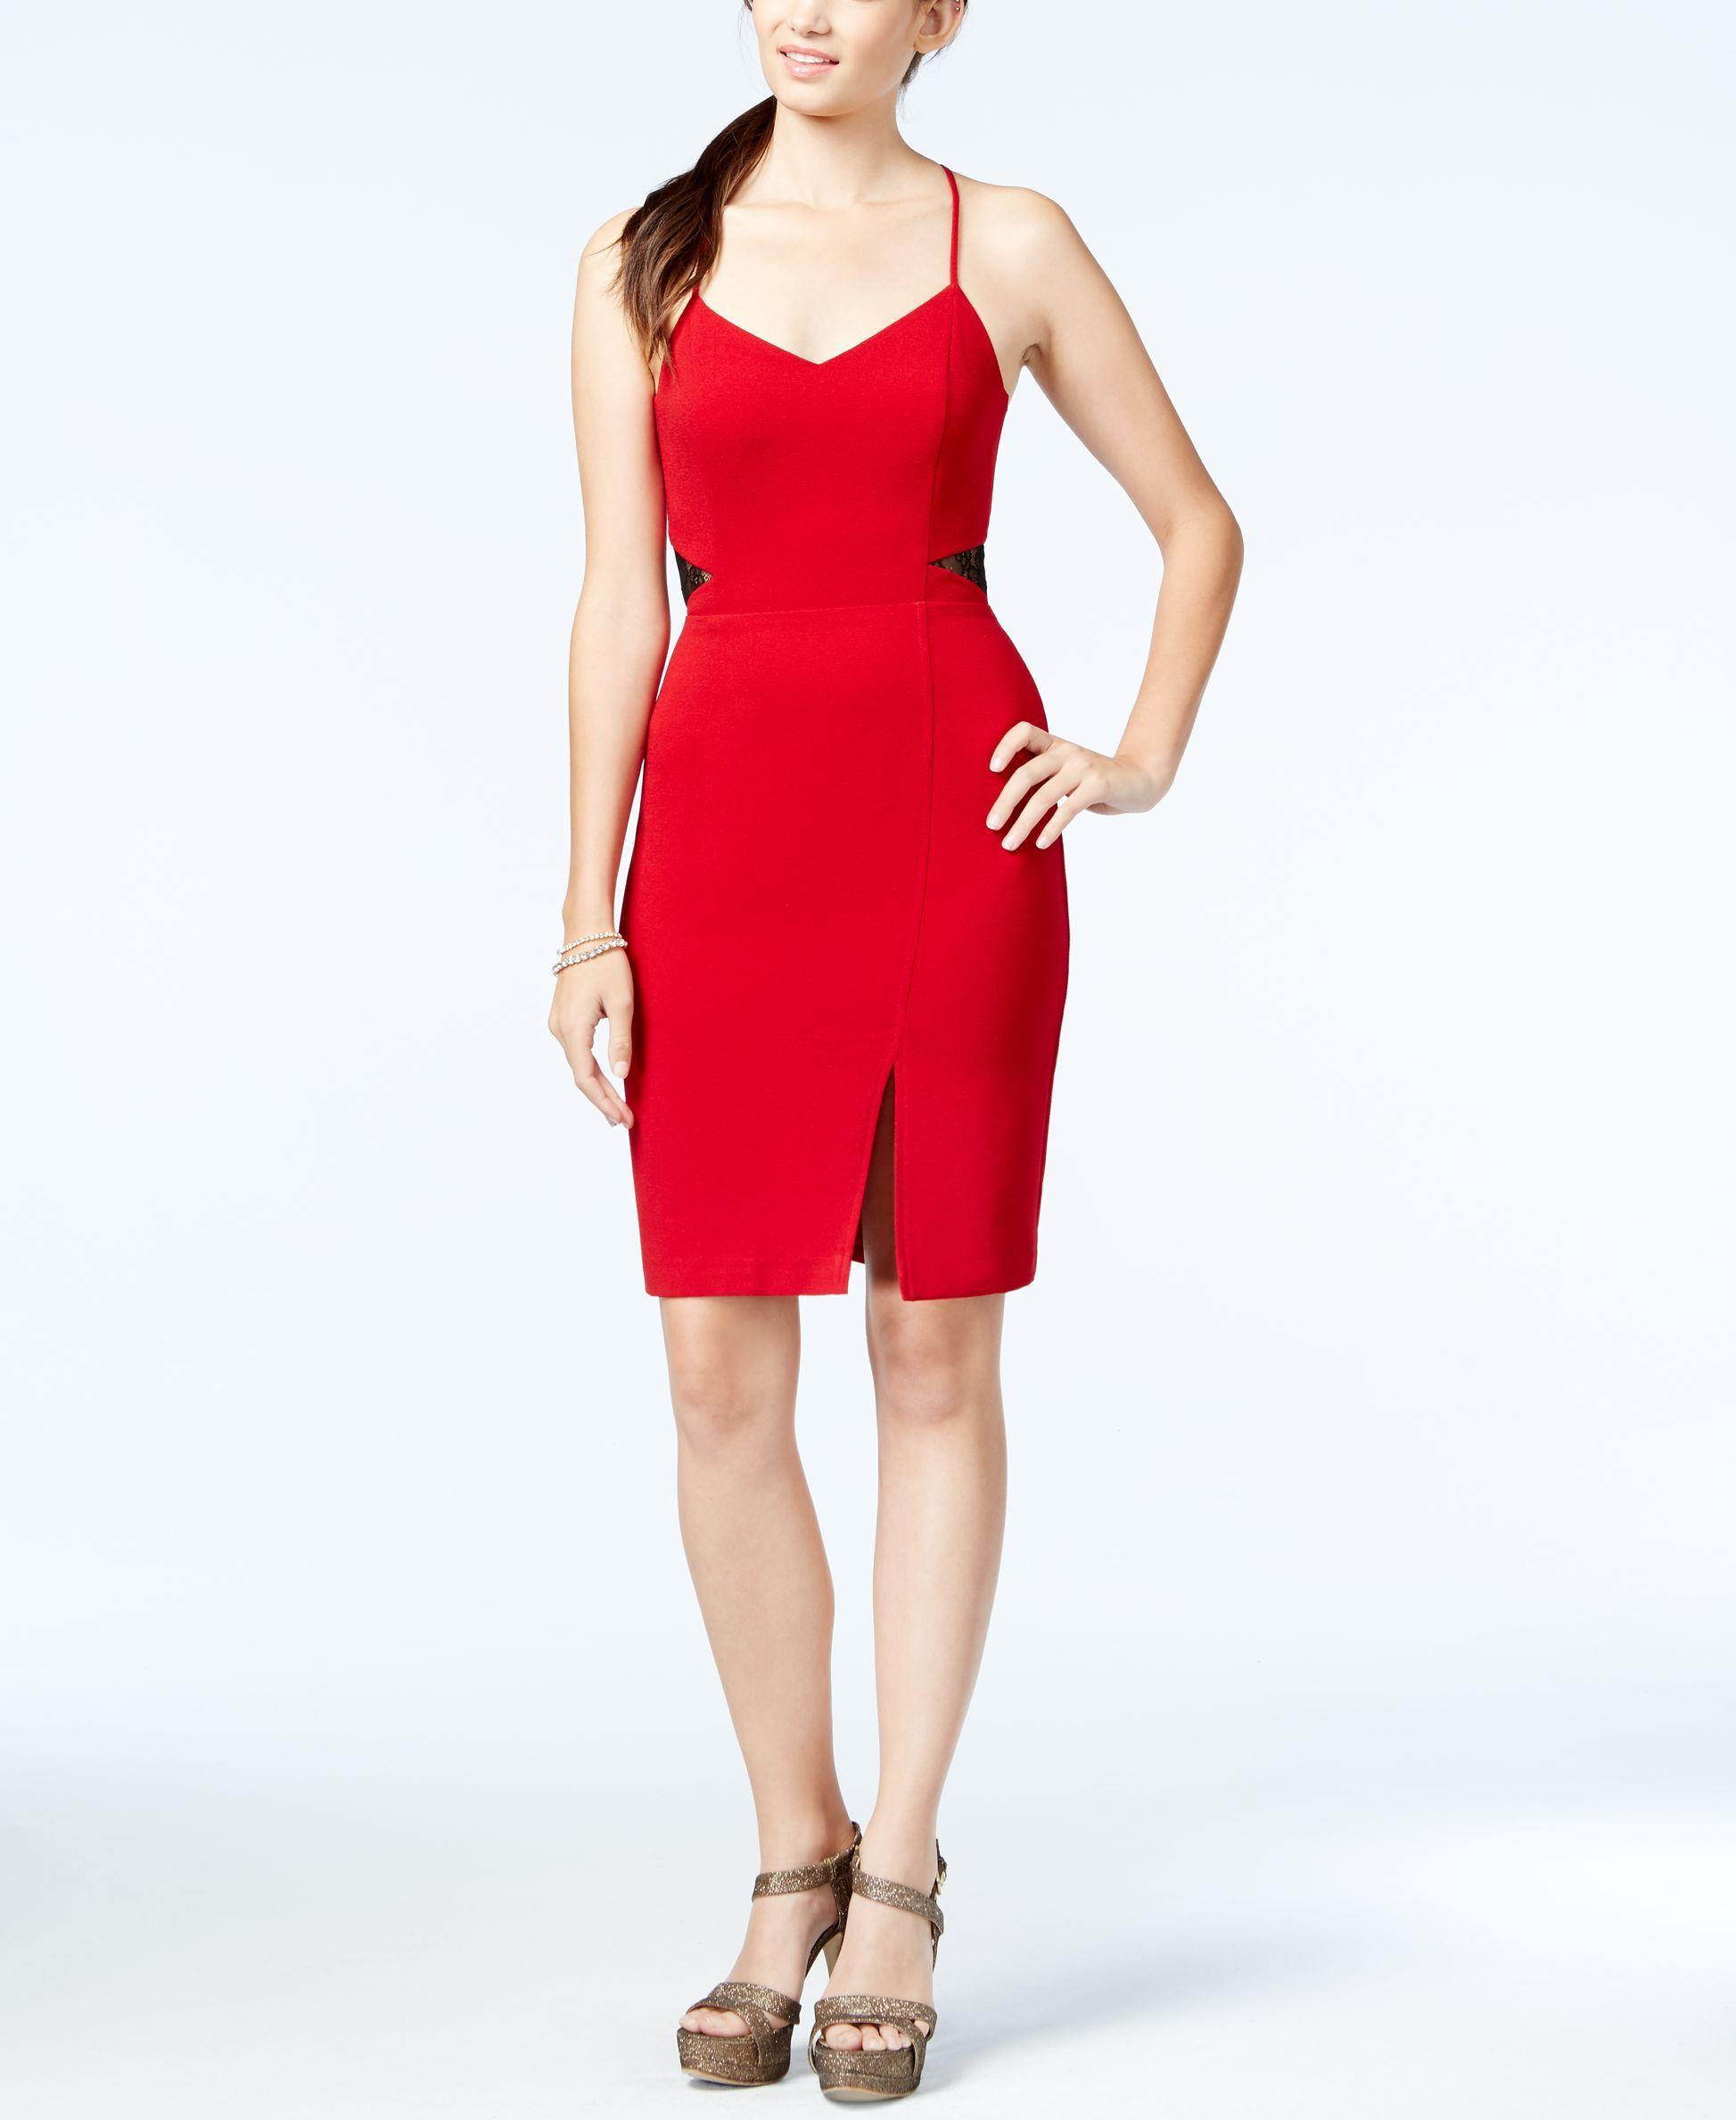 Lace dress macys  Jessica Simpson OpenBack Lace Illusion Sheath Dress  Products